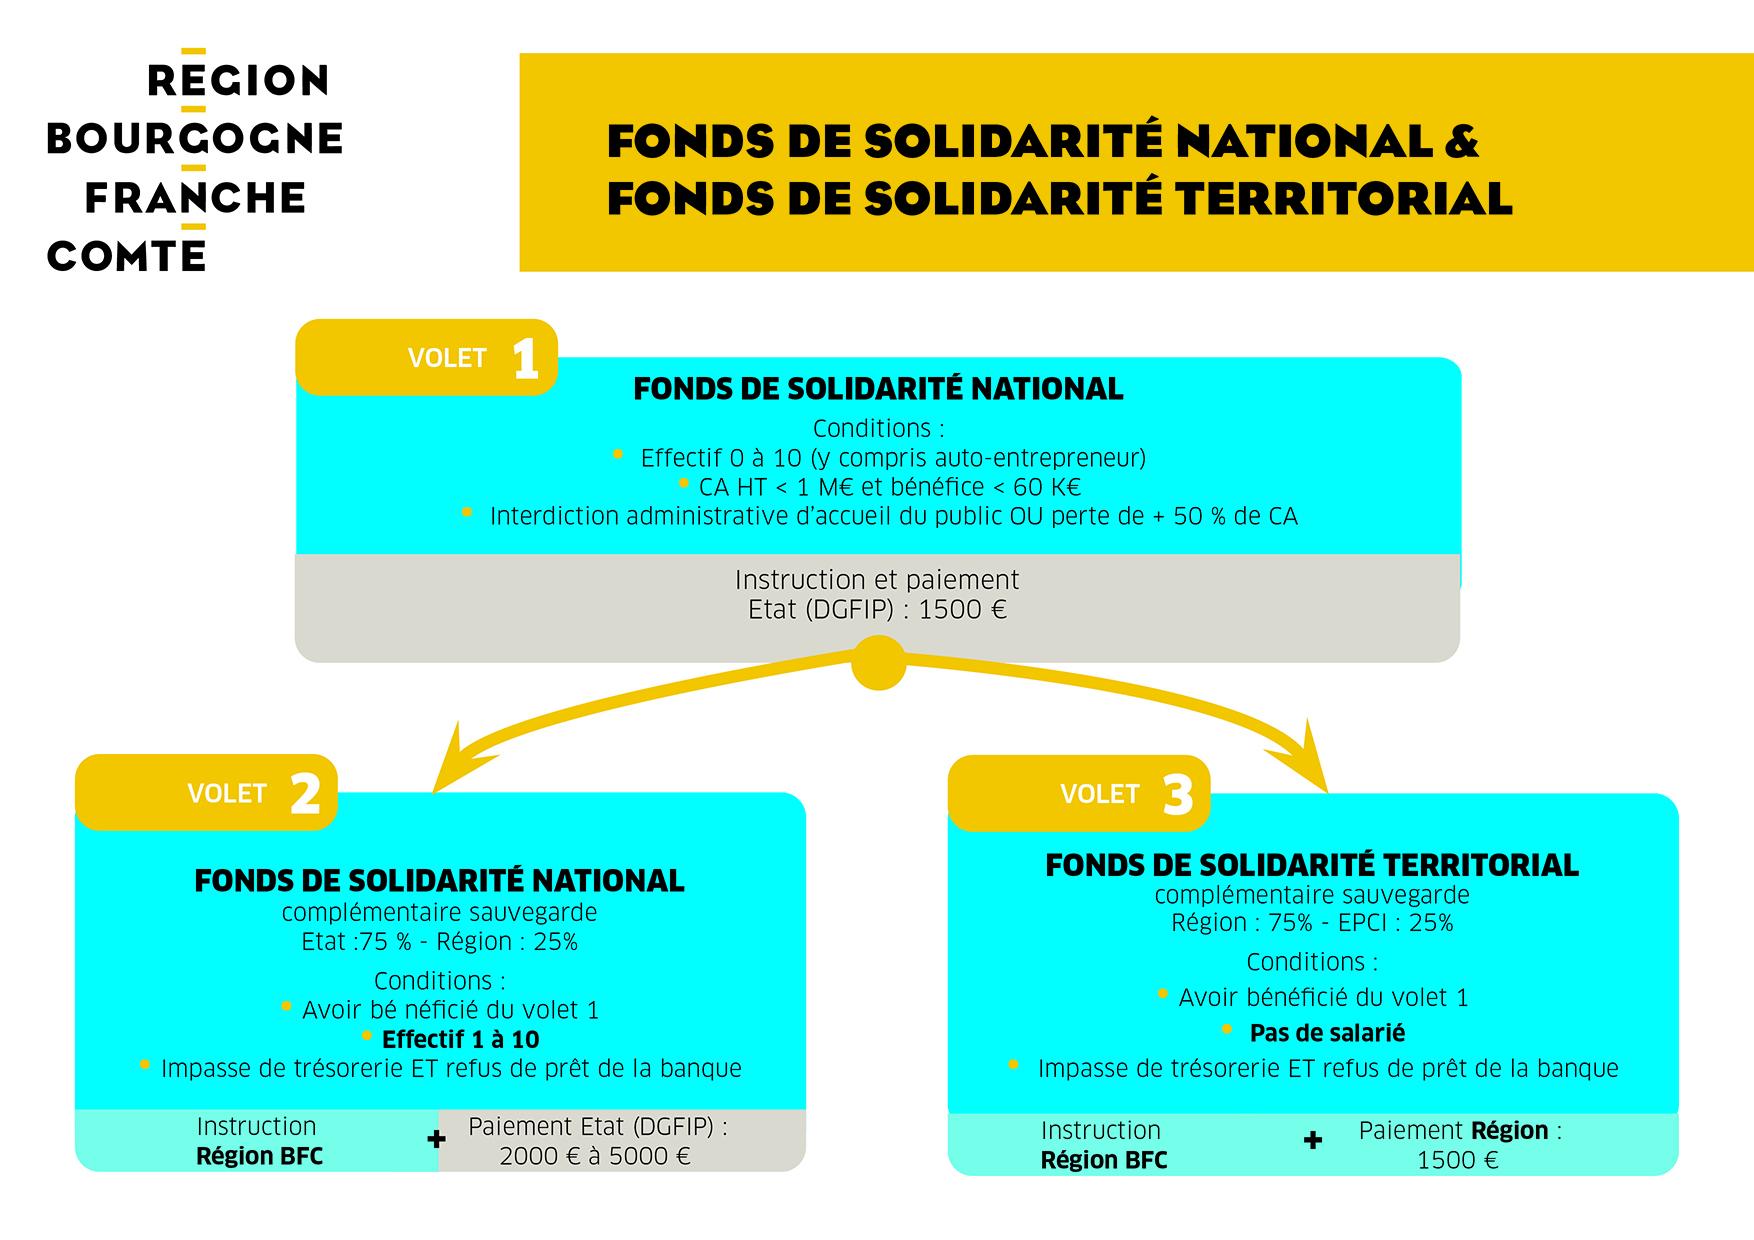 Fonds de solidarité territorial Région-EPCI